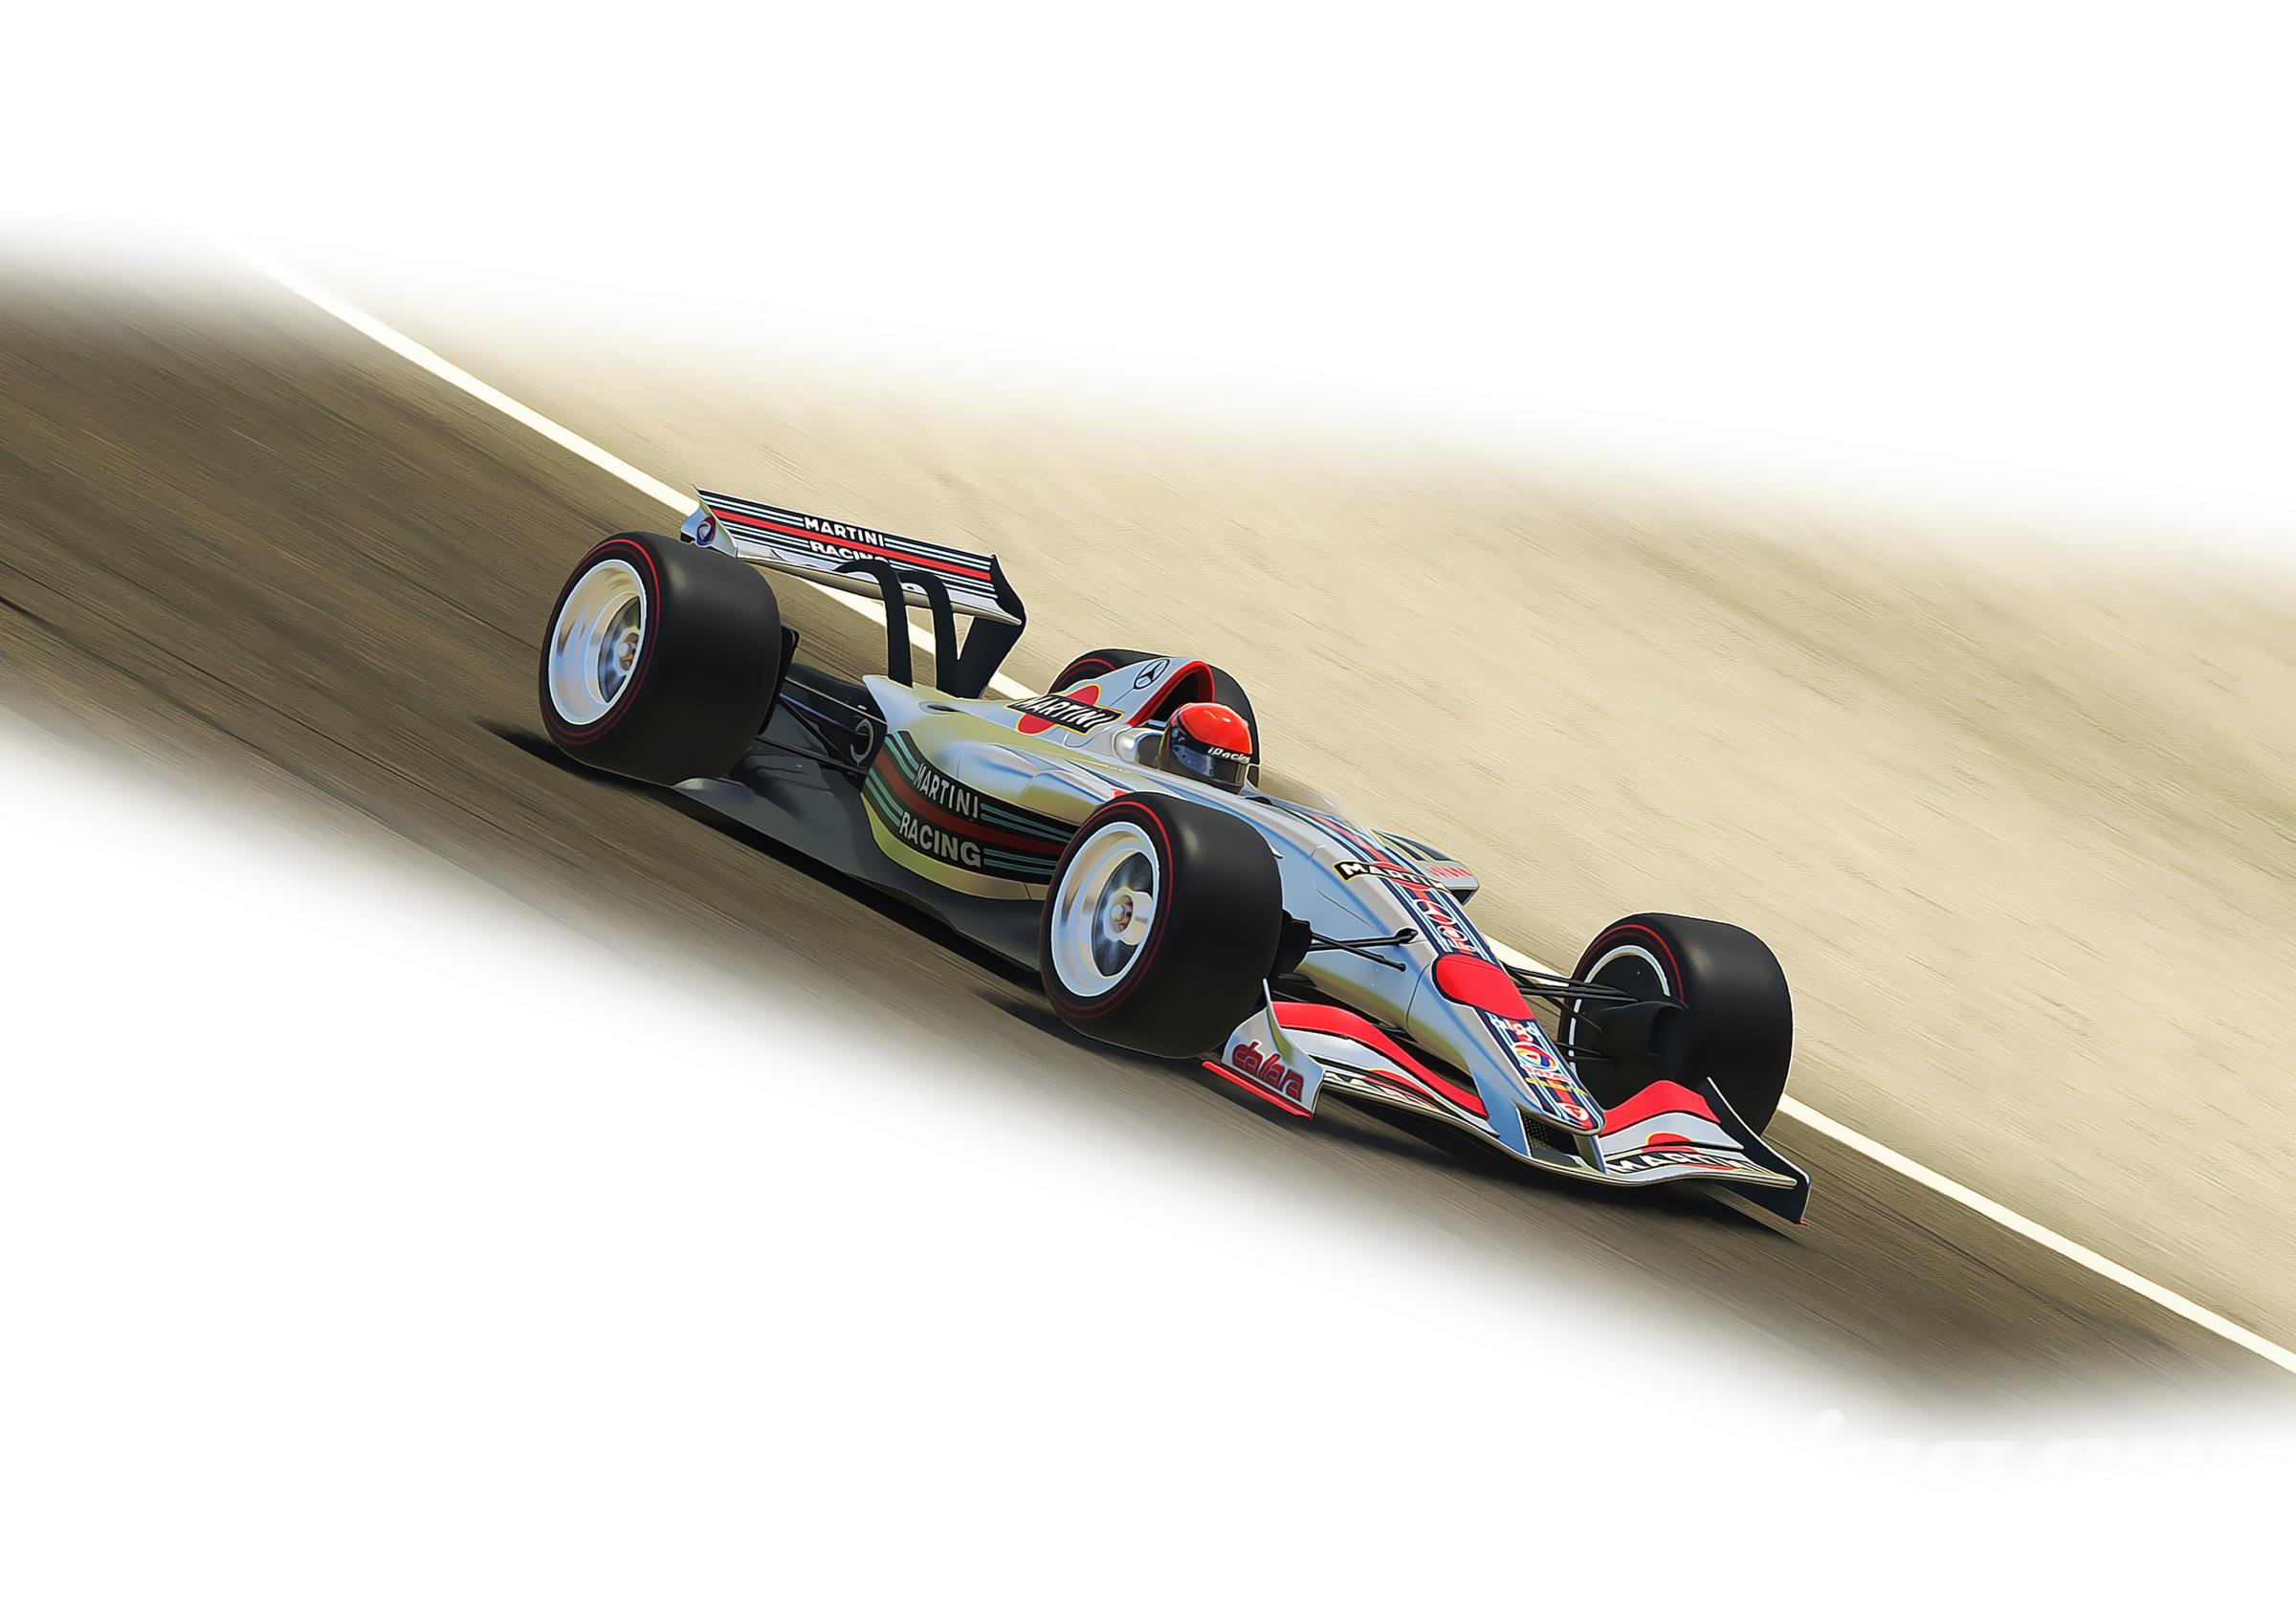 Preview of Martini Dallara IR01 v3C 2021 by Doyle Lowrance